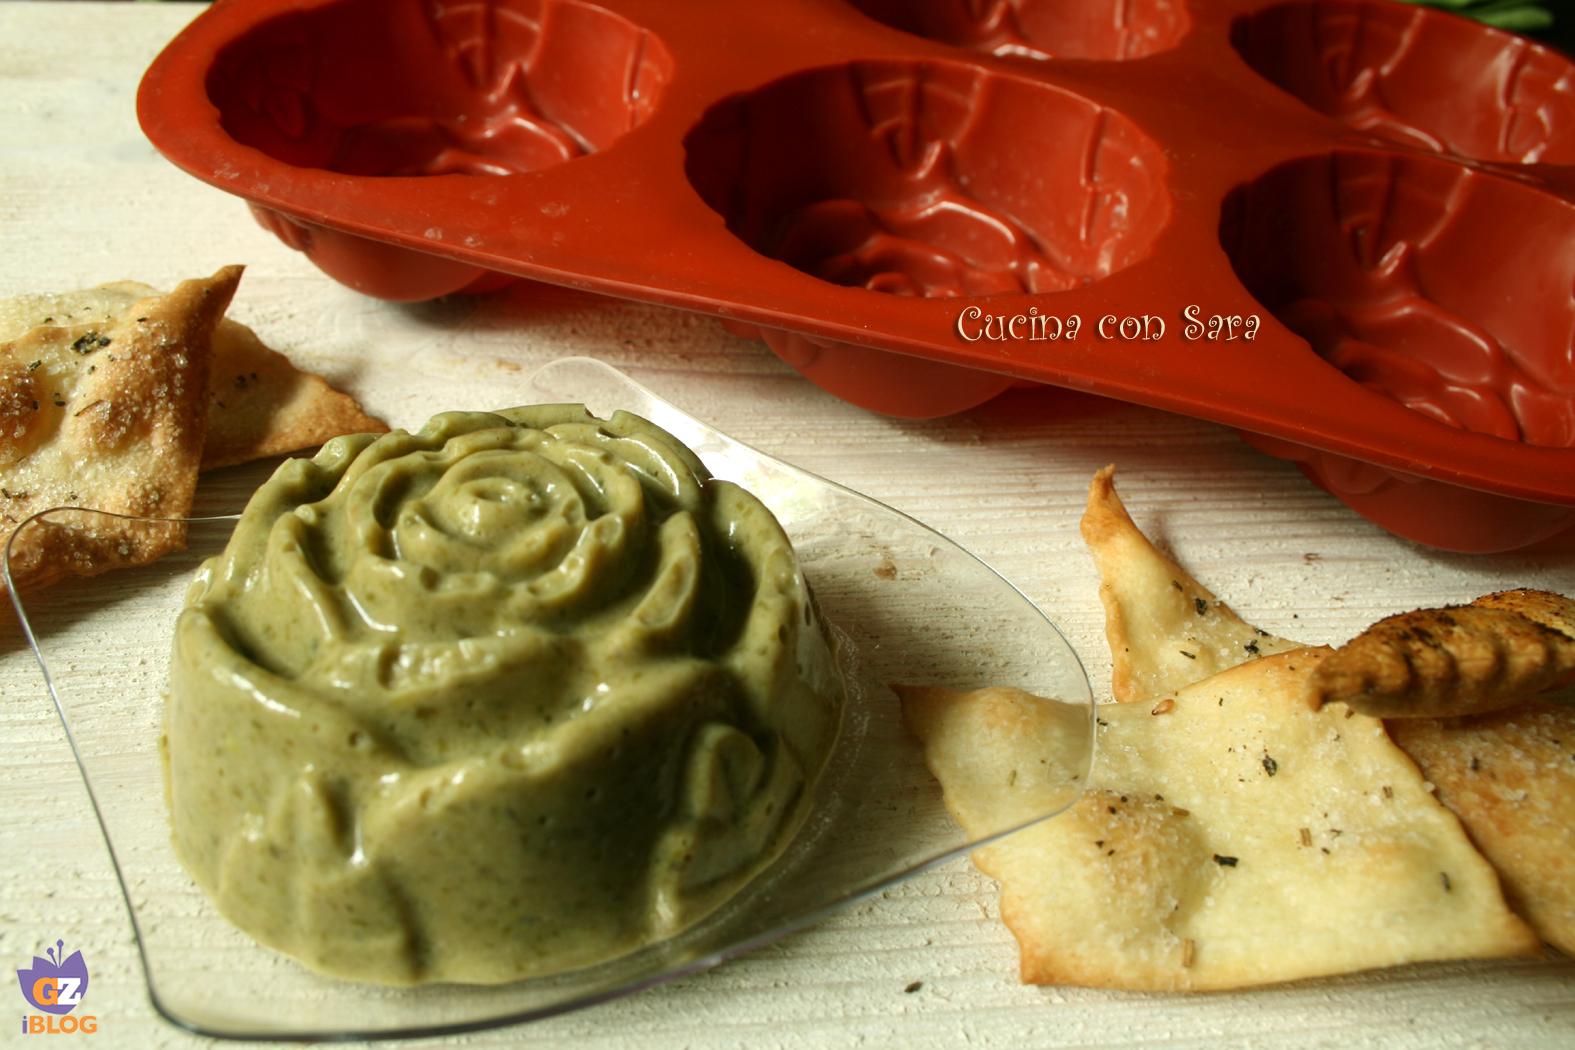 Mousse di fagiolini, cucina con sara